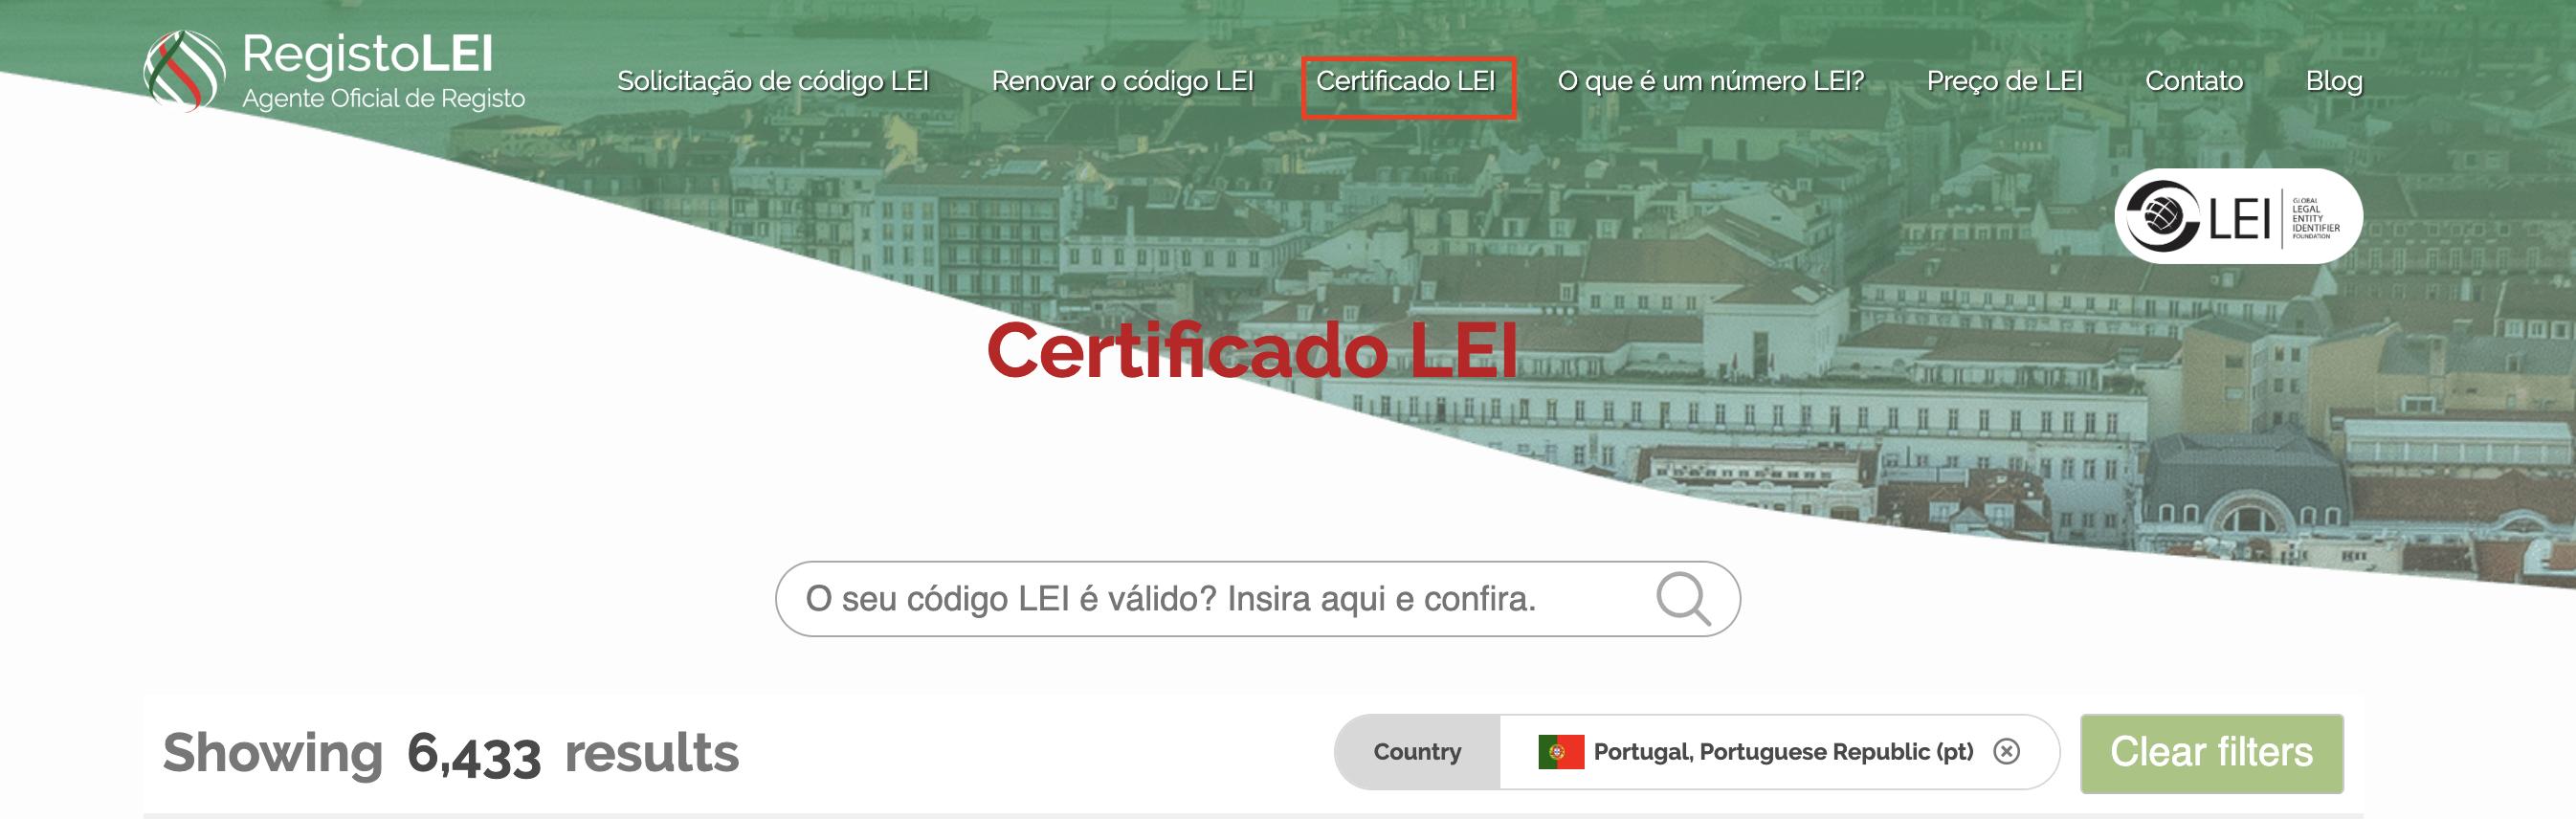 Certificado LEI